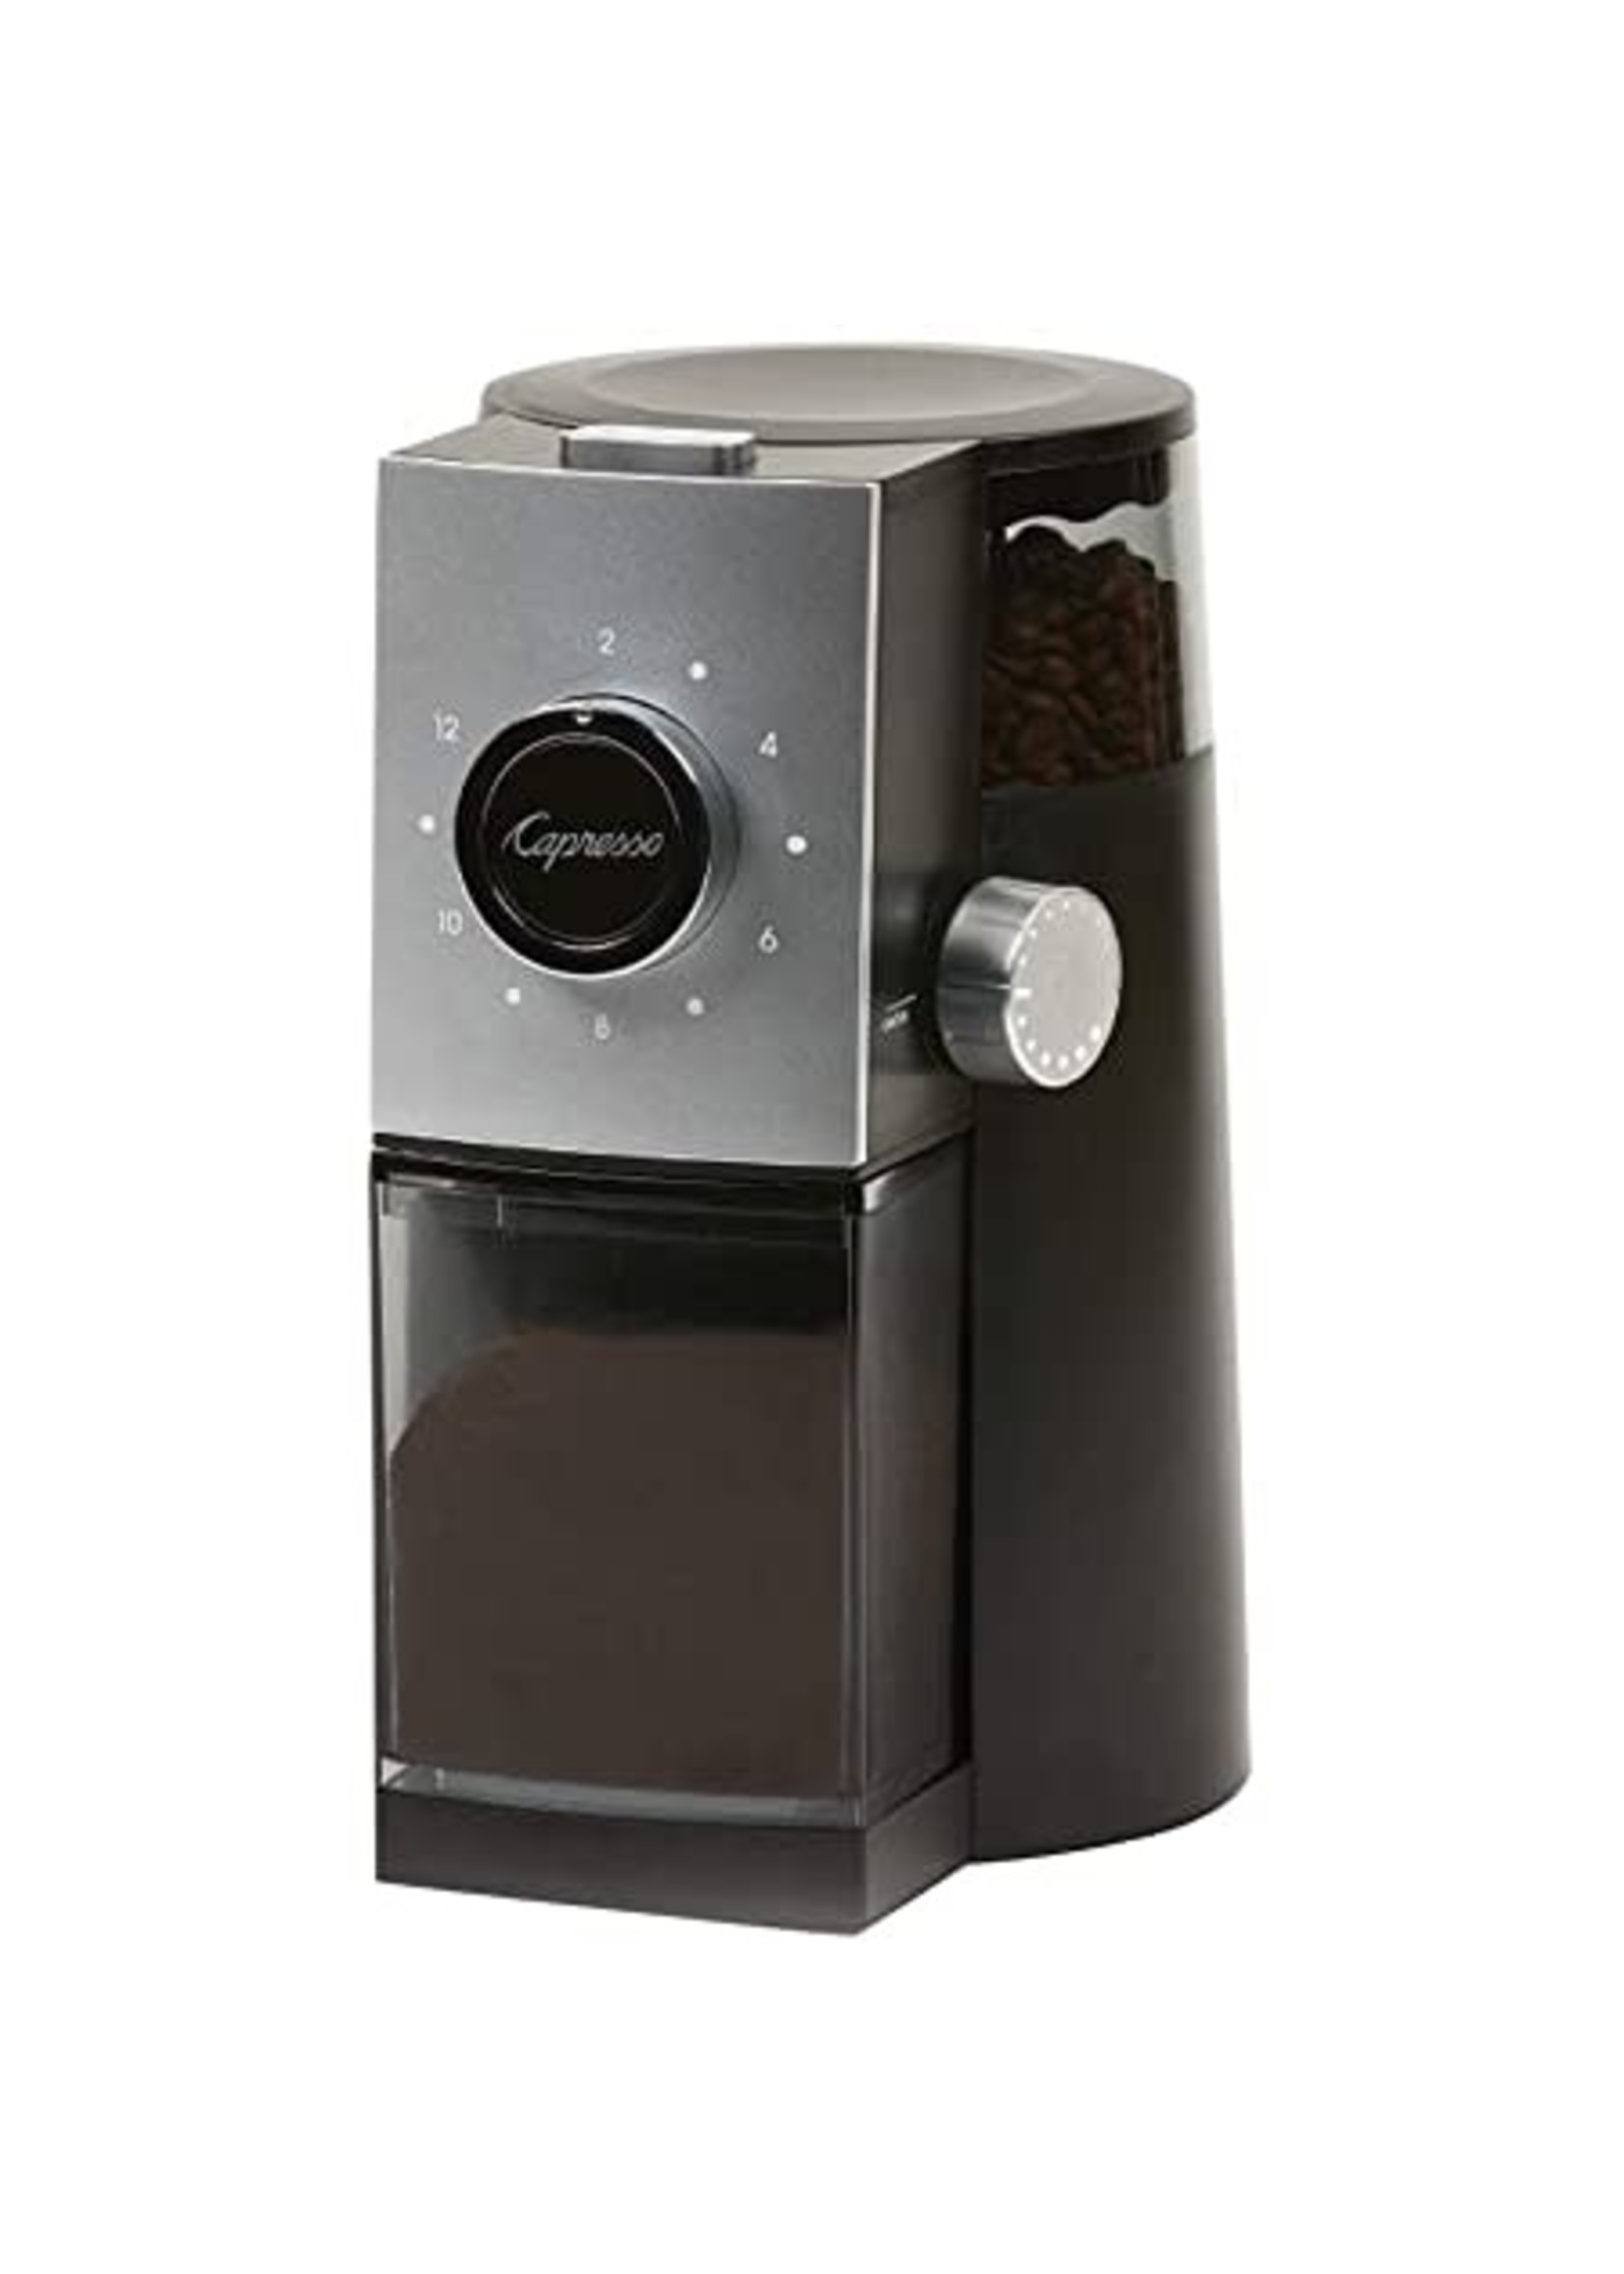 Capresso Capresso Grind Select Coffe Grinder